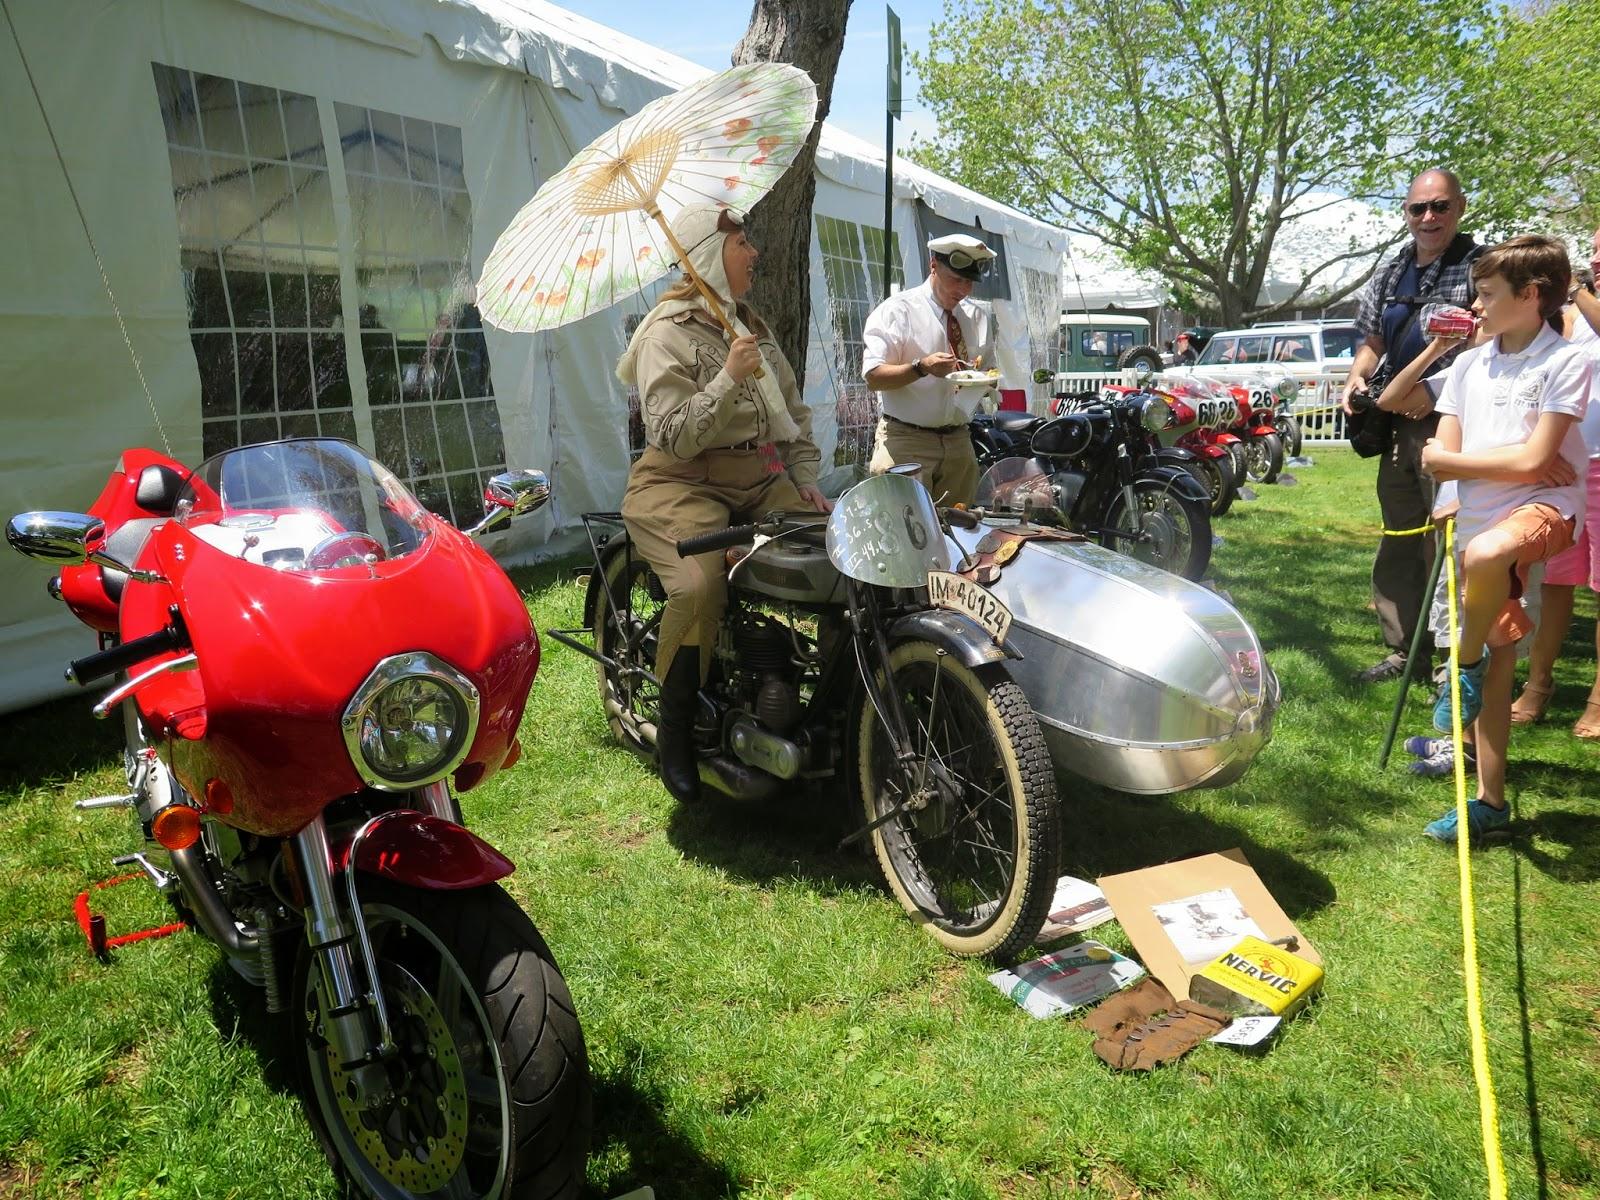 1929 Triumph N Sport with Hindenburg Sidecar - Moto Bellissima